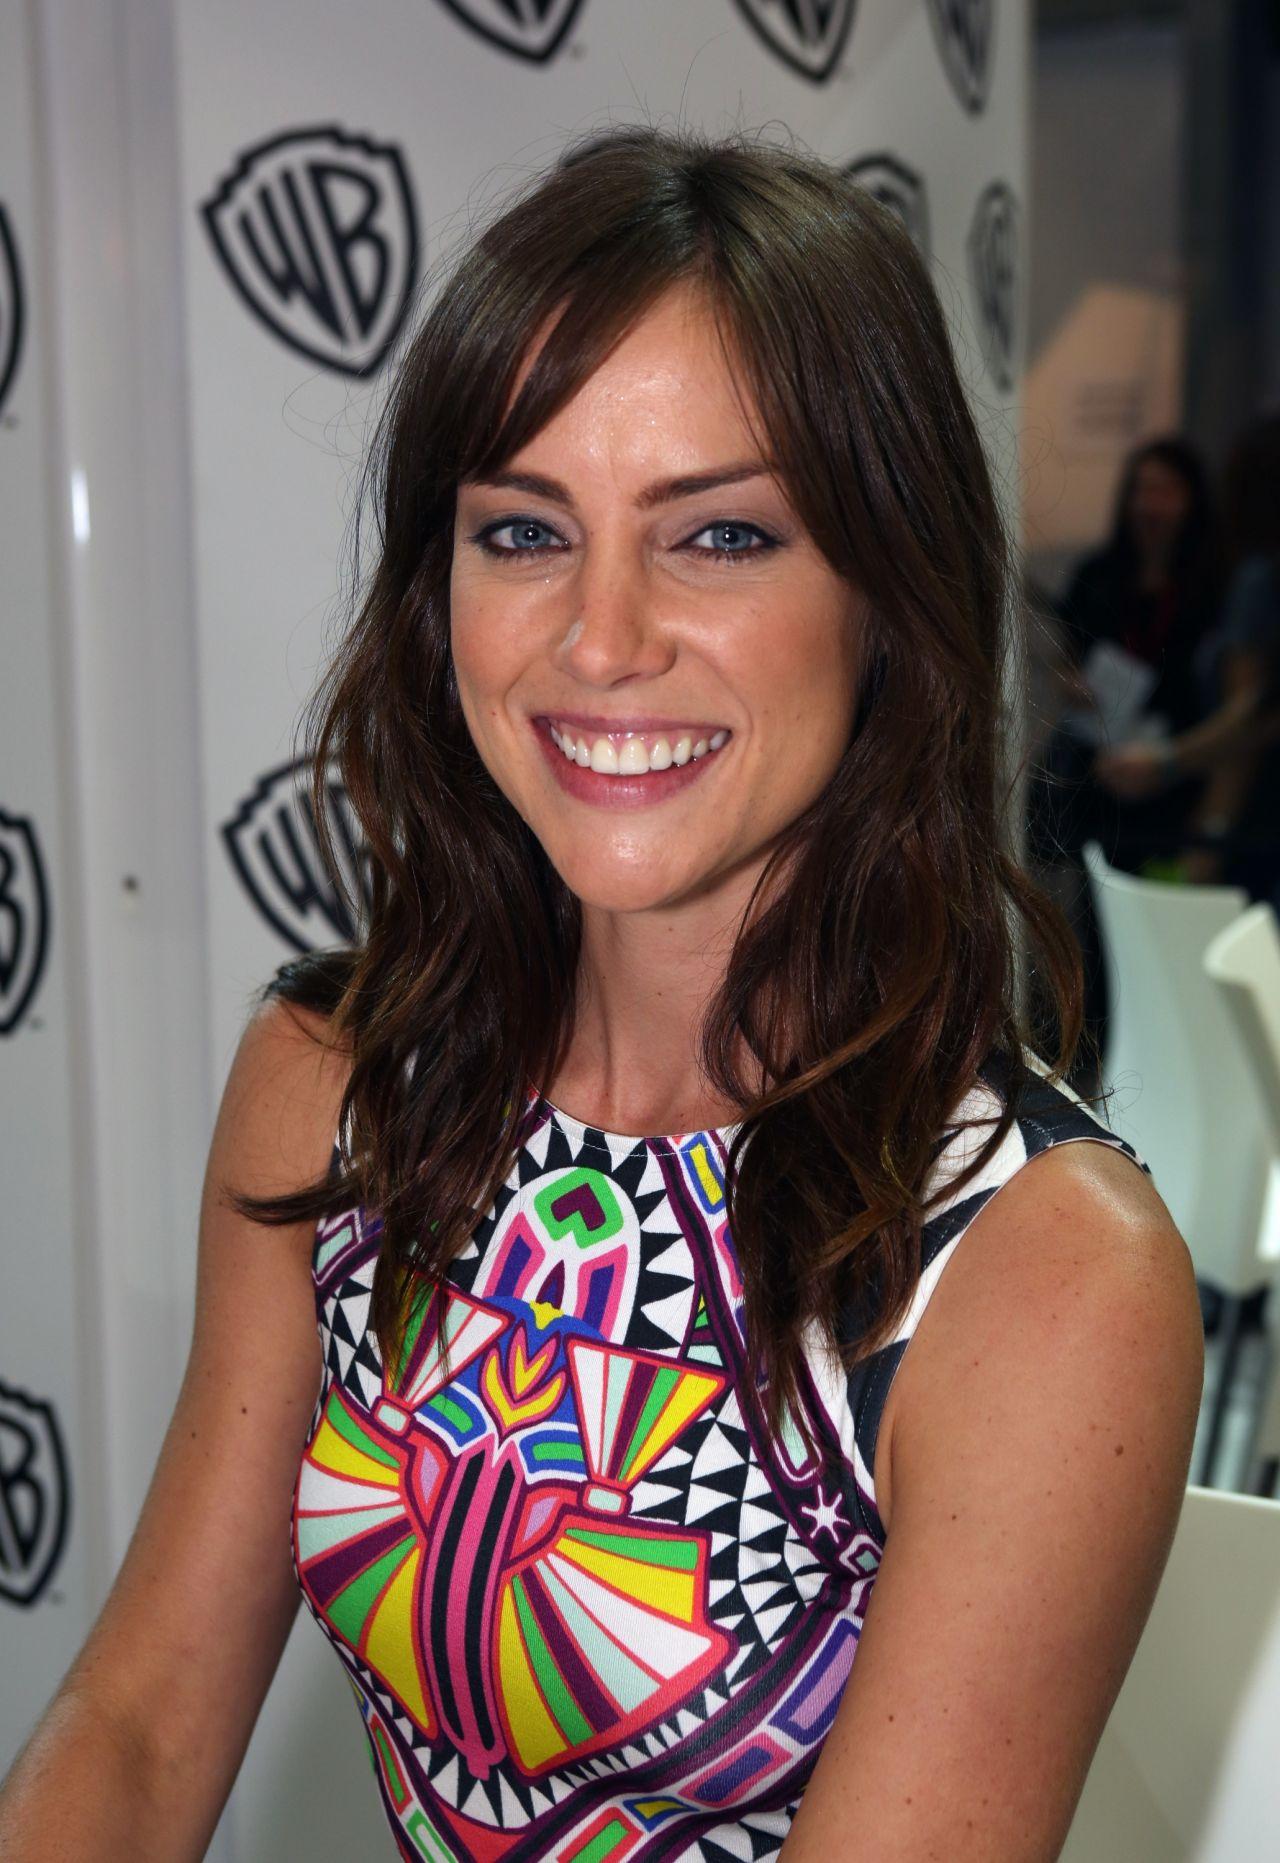 Jessica Stroup - Warner Bros. at SDCC 2014